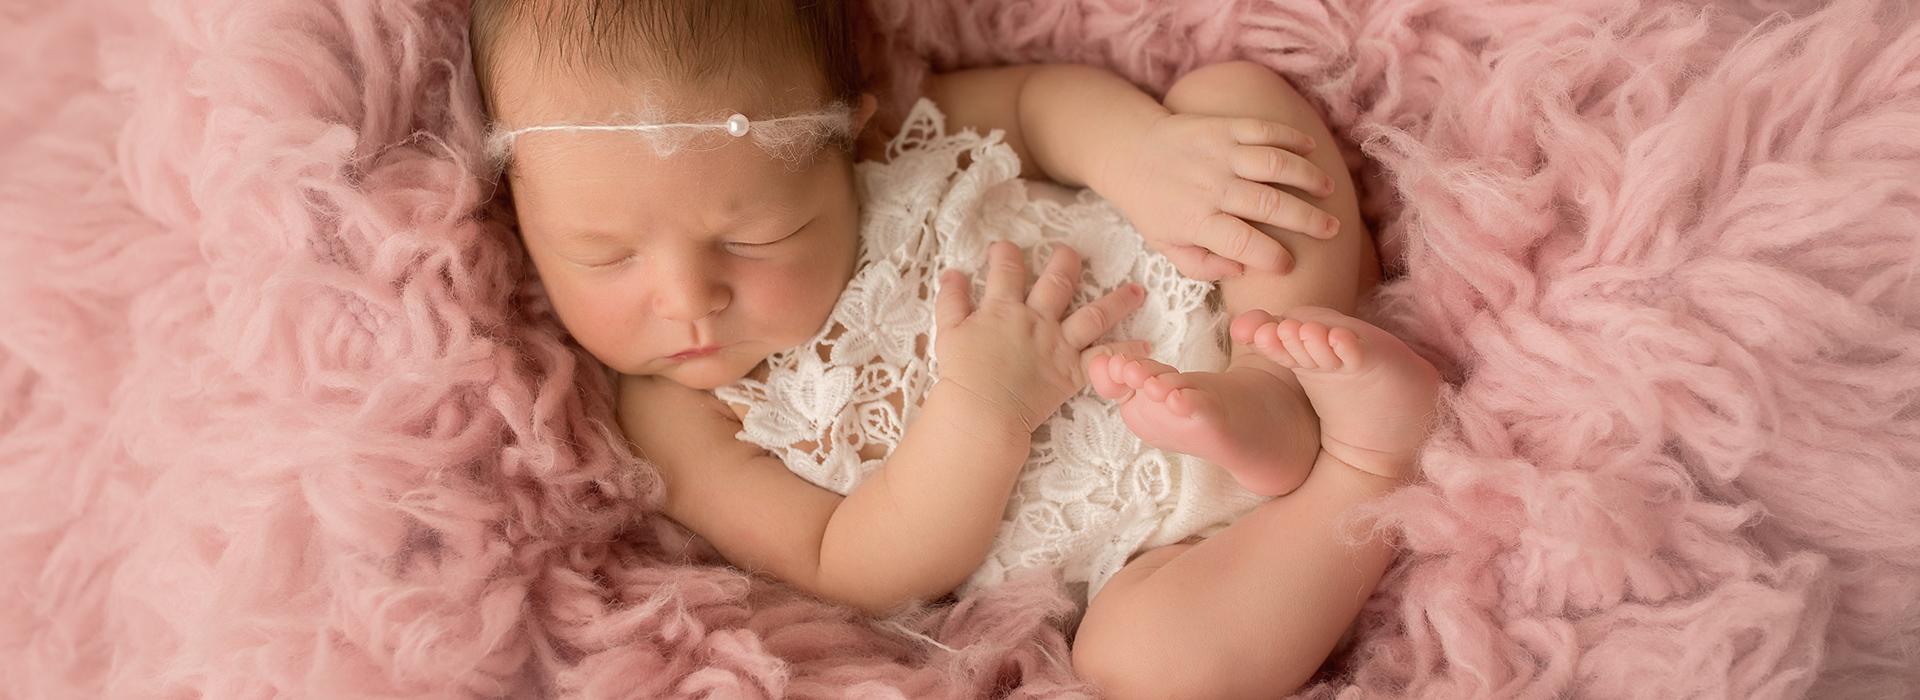 Baby-fertility